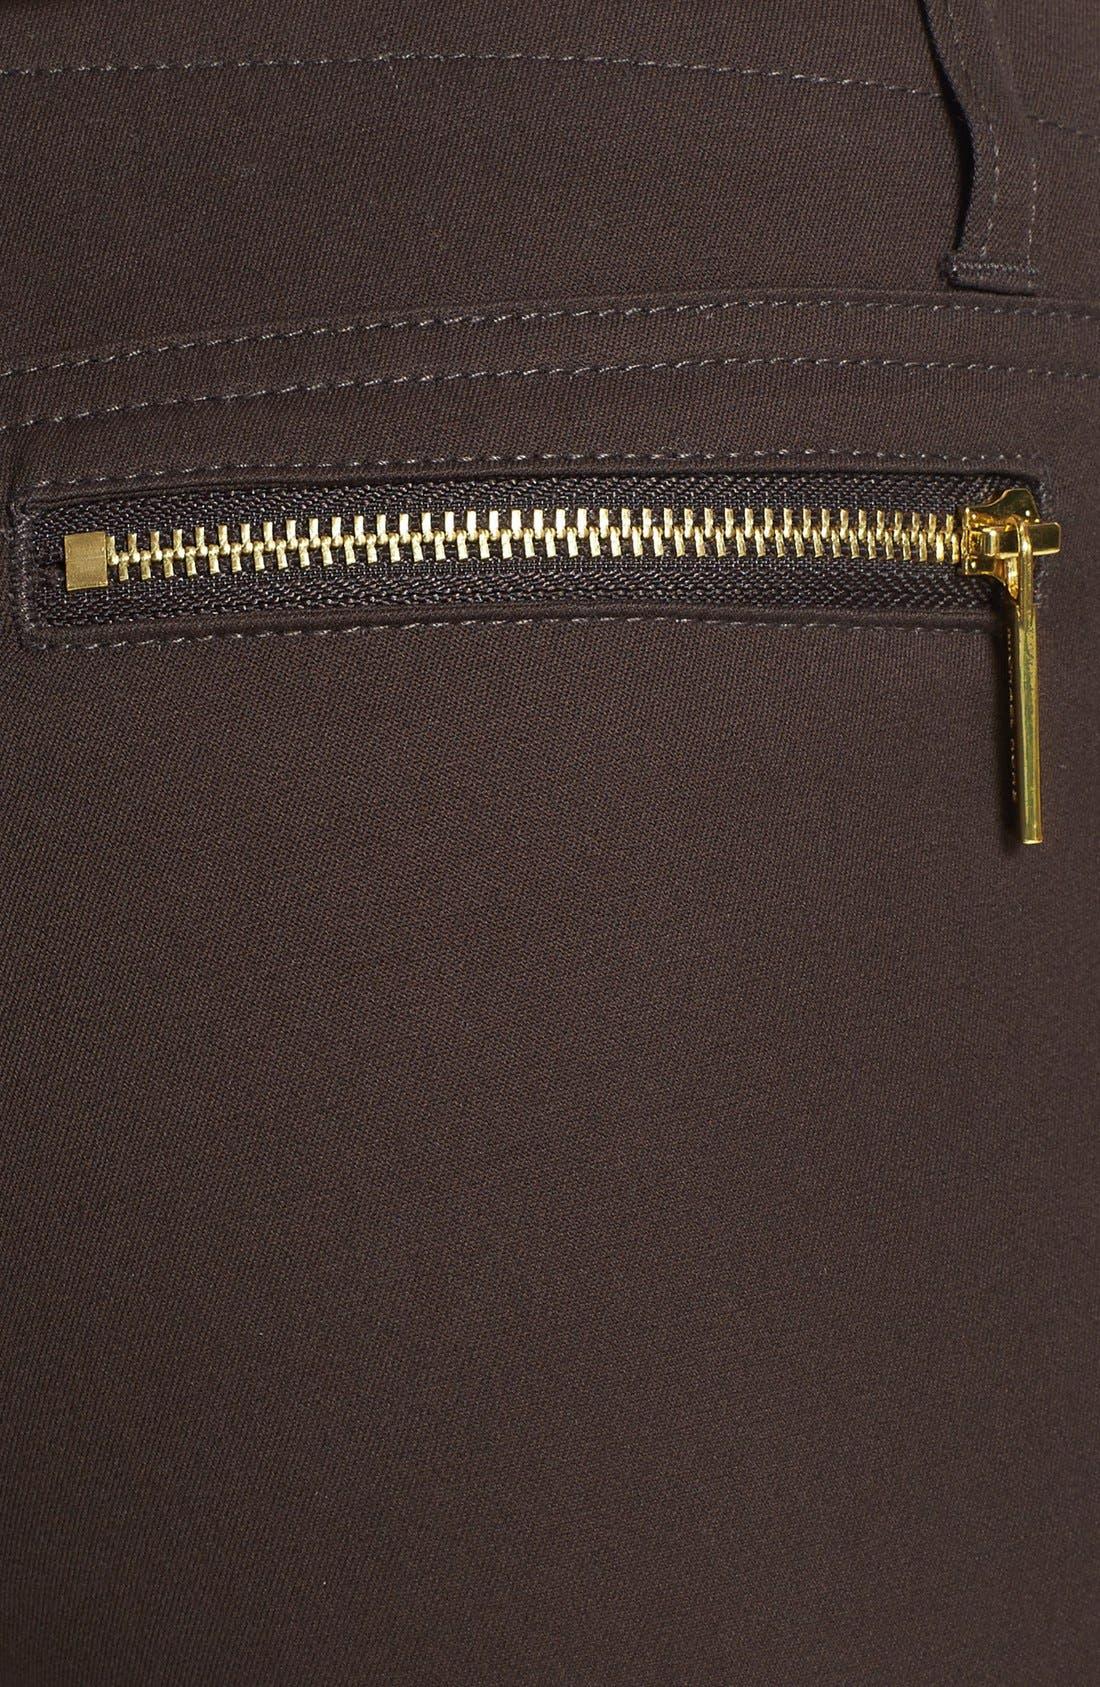 Zip Pocket Skinny Pants,                             Alternate thumbnail 3, color,                             Chocolate